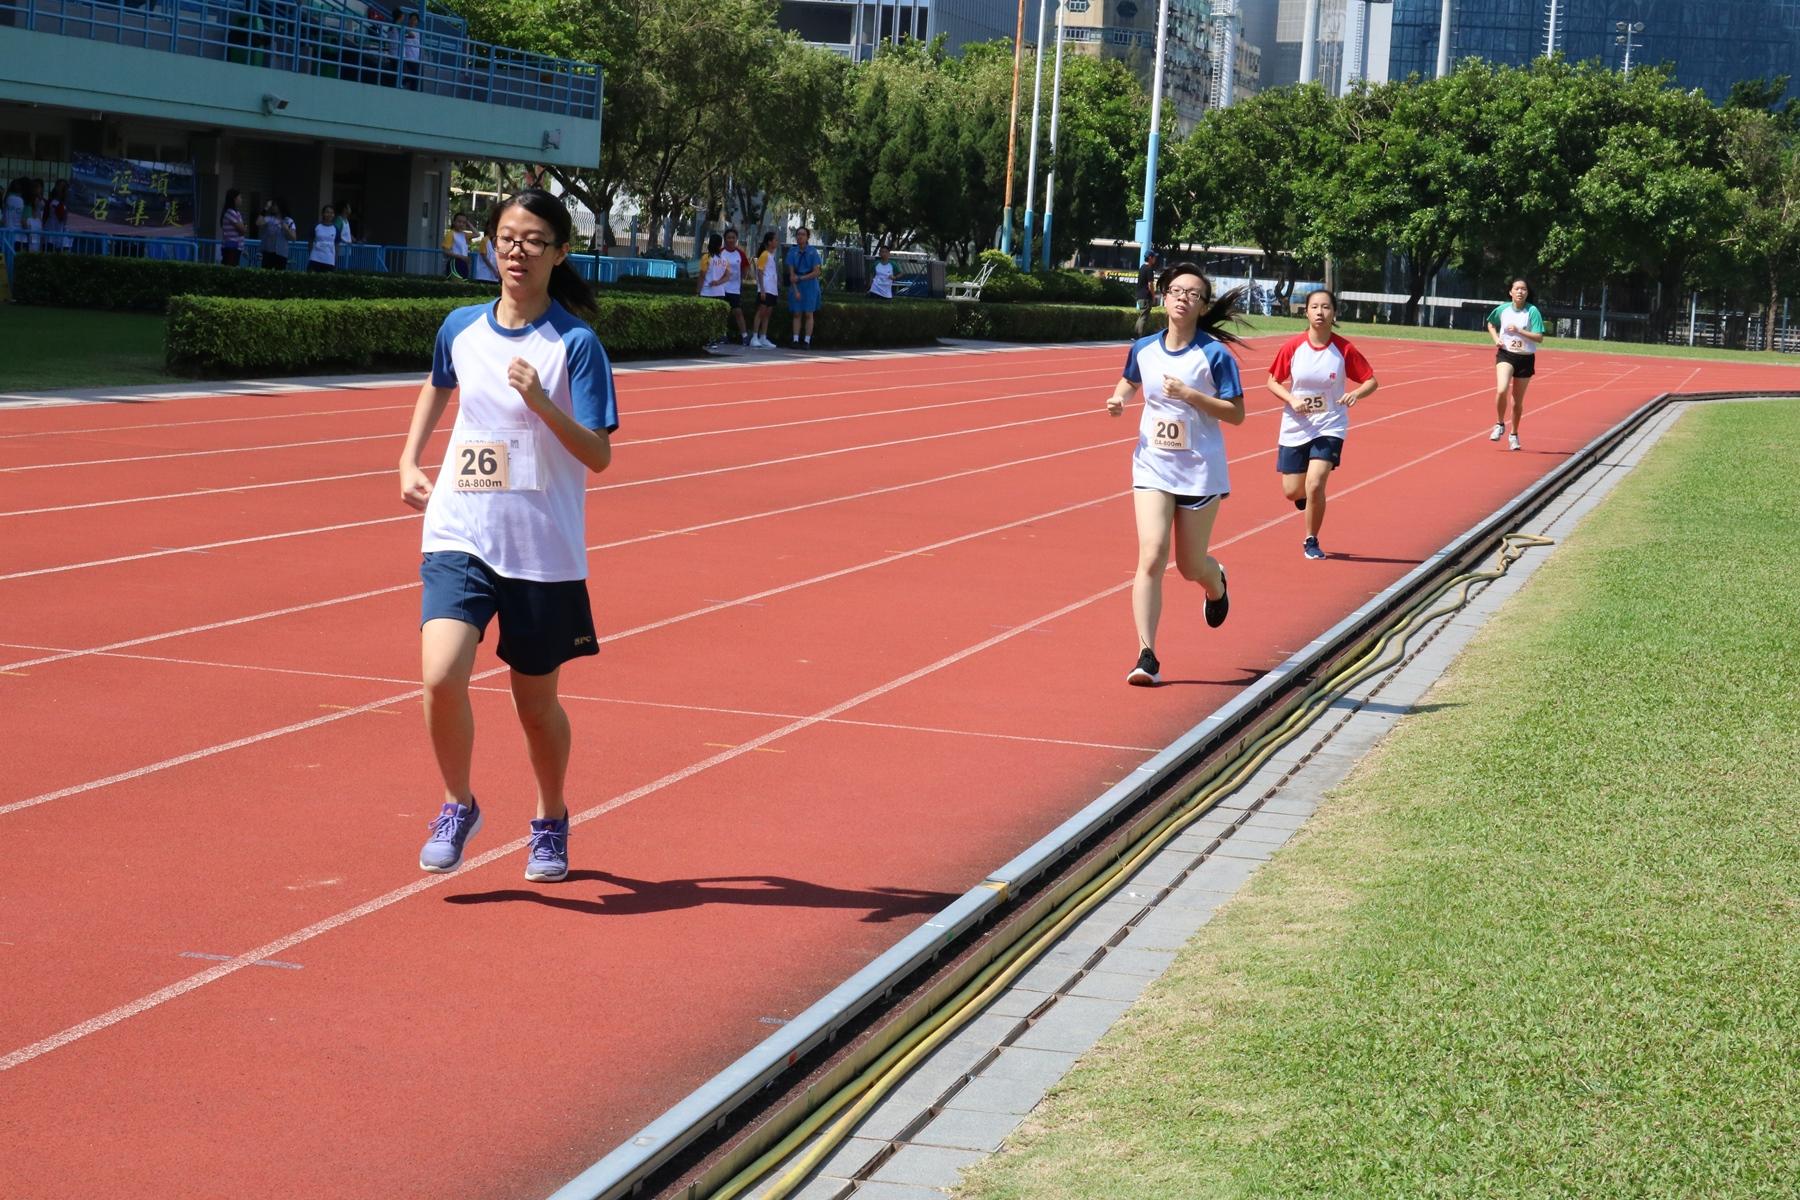 http://www.npc.edu.hk/sites/default/files/img_5592.jpg